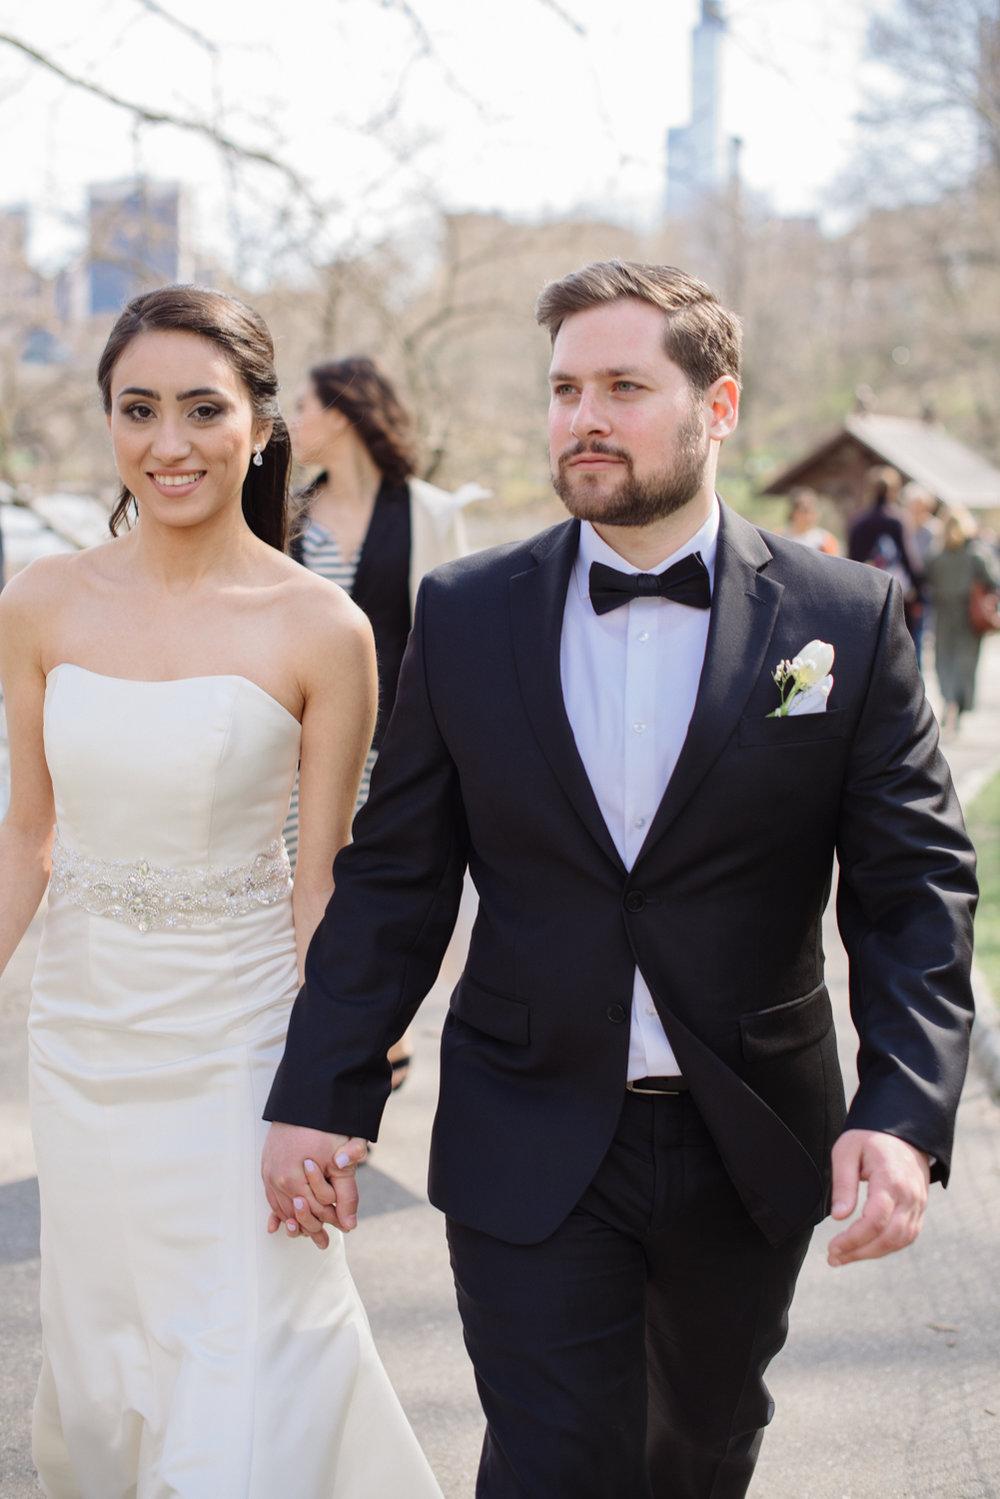 Central Park Elopement- New York City Weddings- Olivia Christina Photography